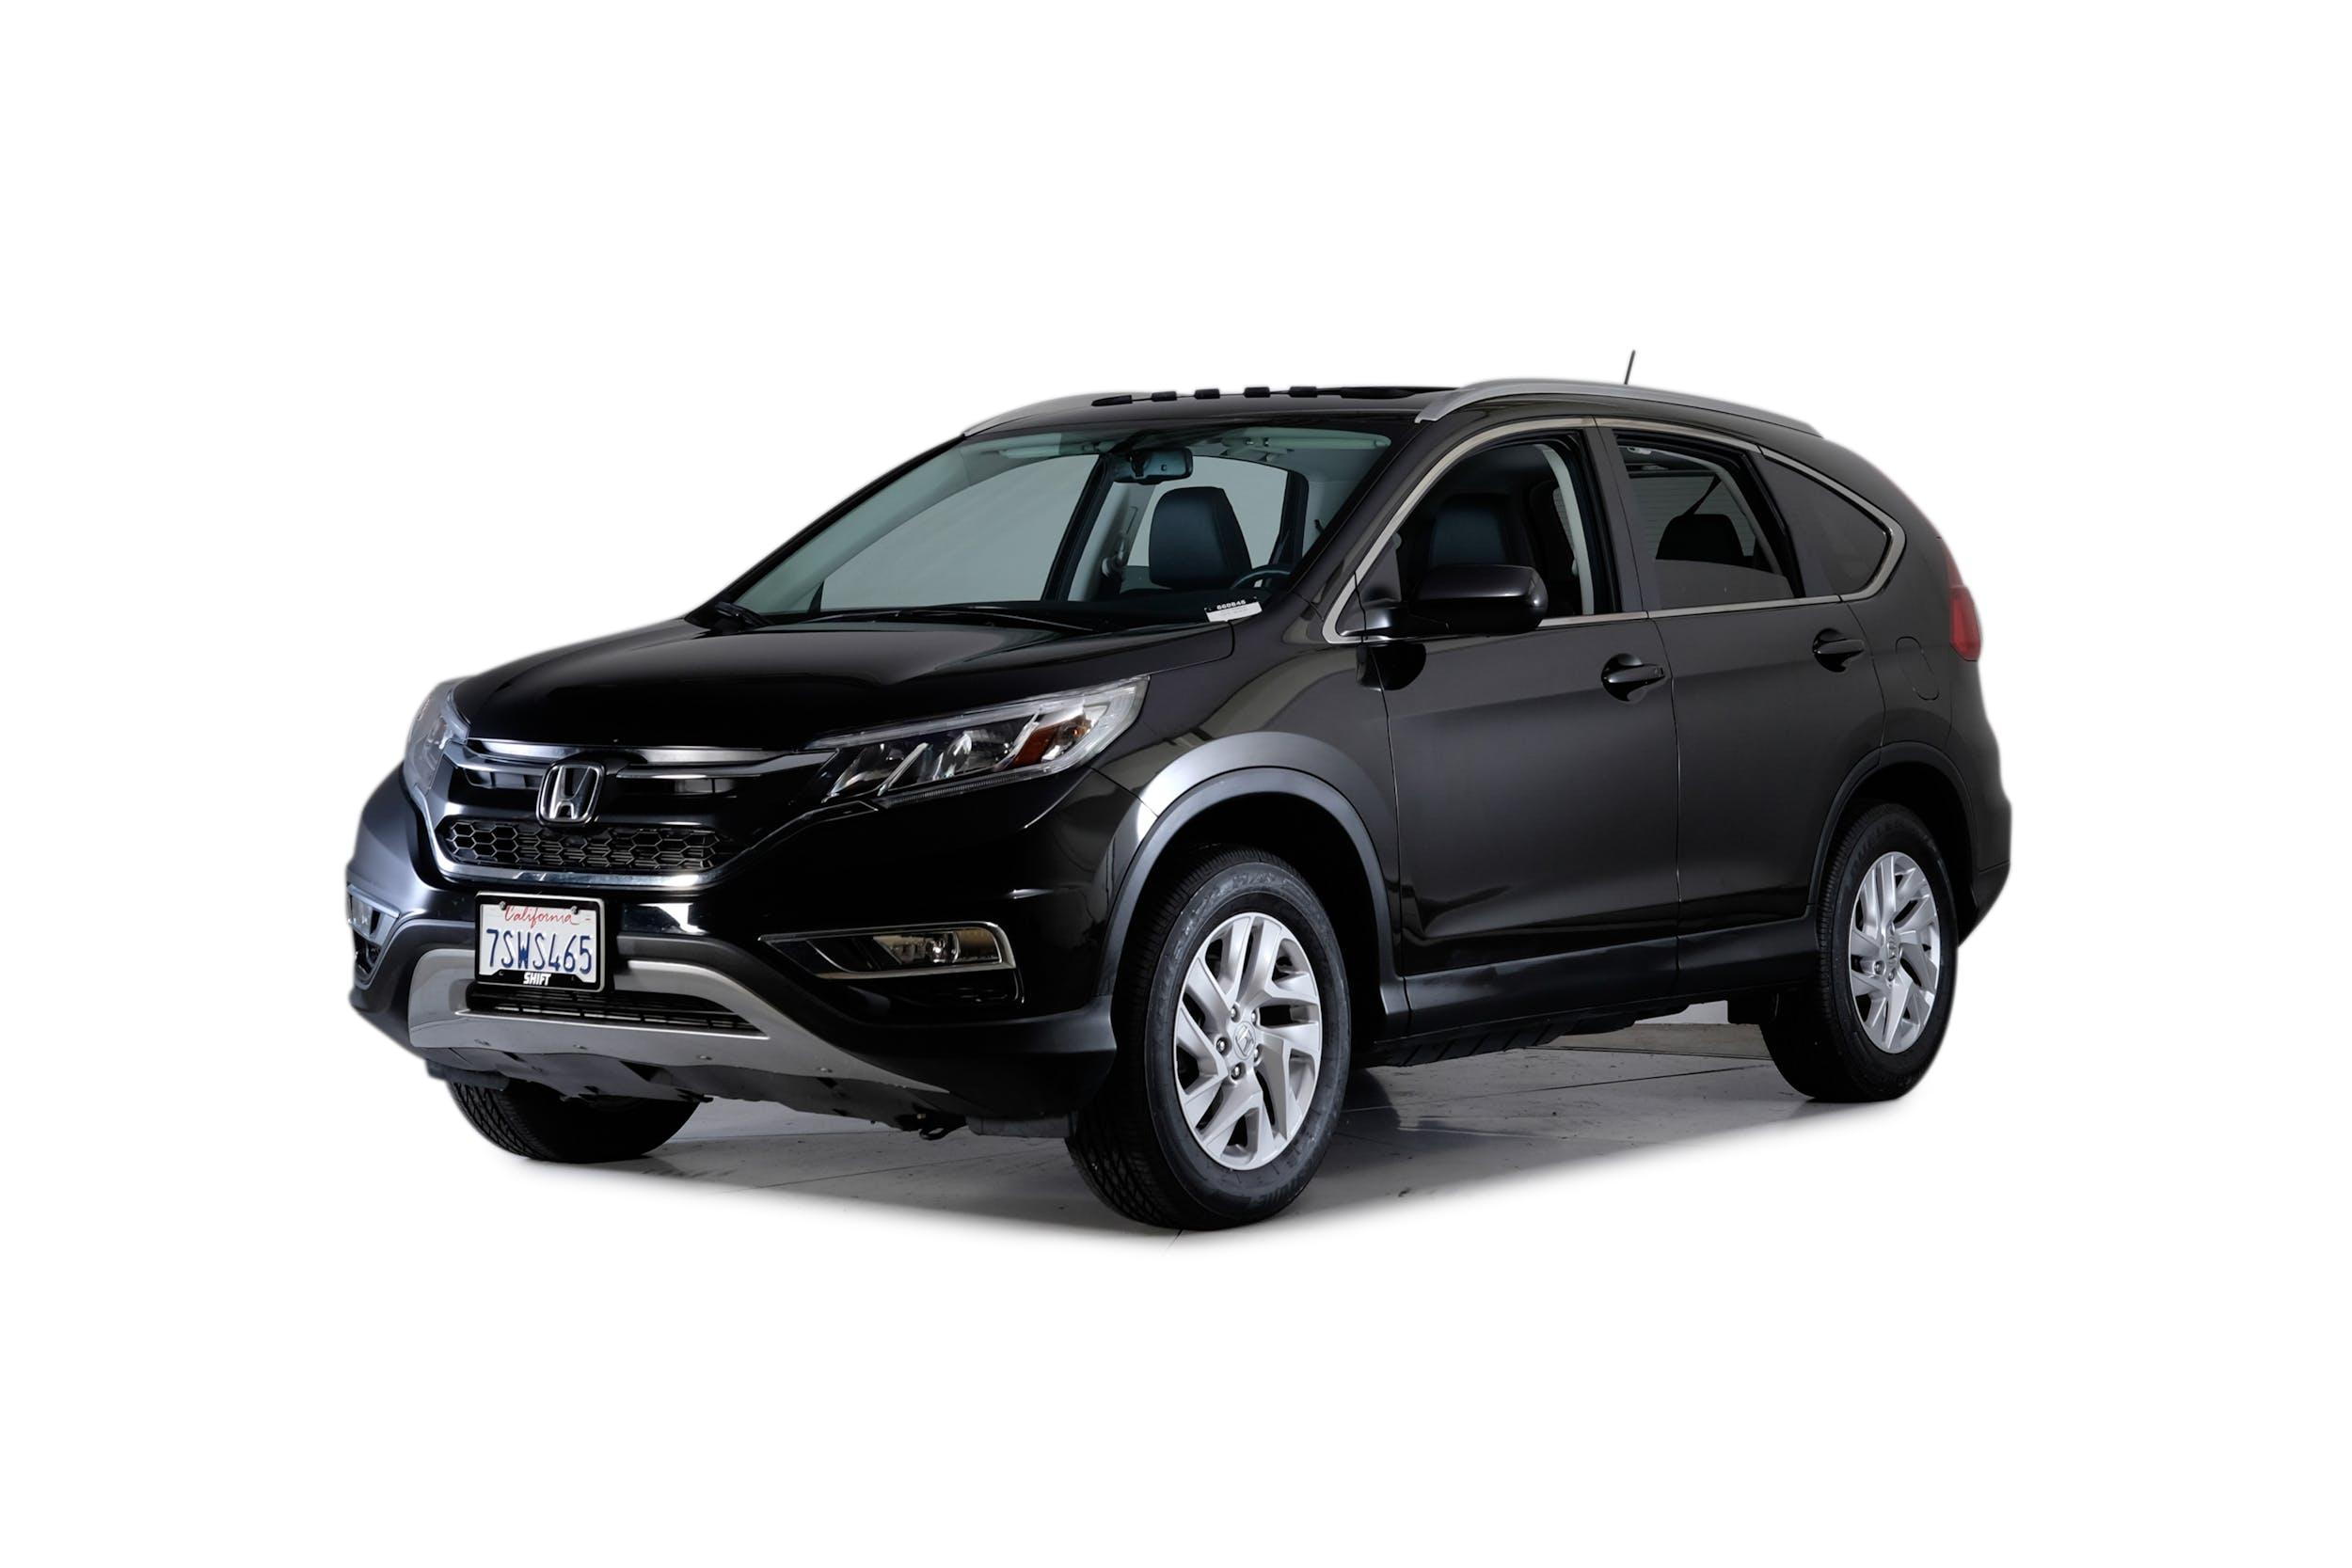 Used Honda for sale in San Francisco | Shift